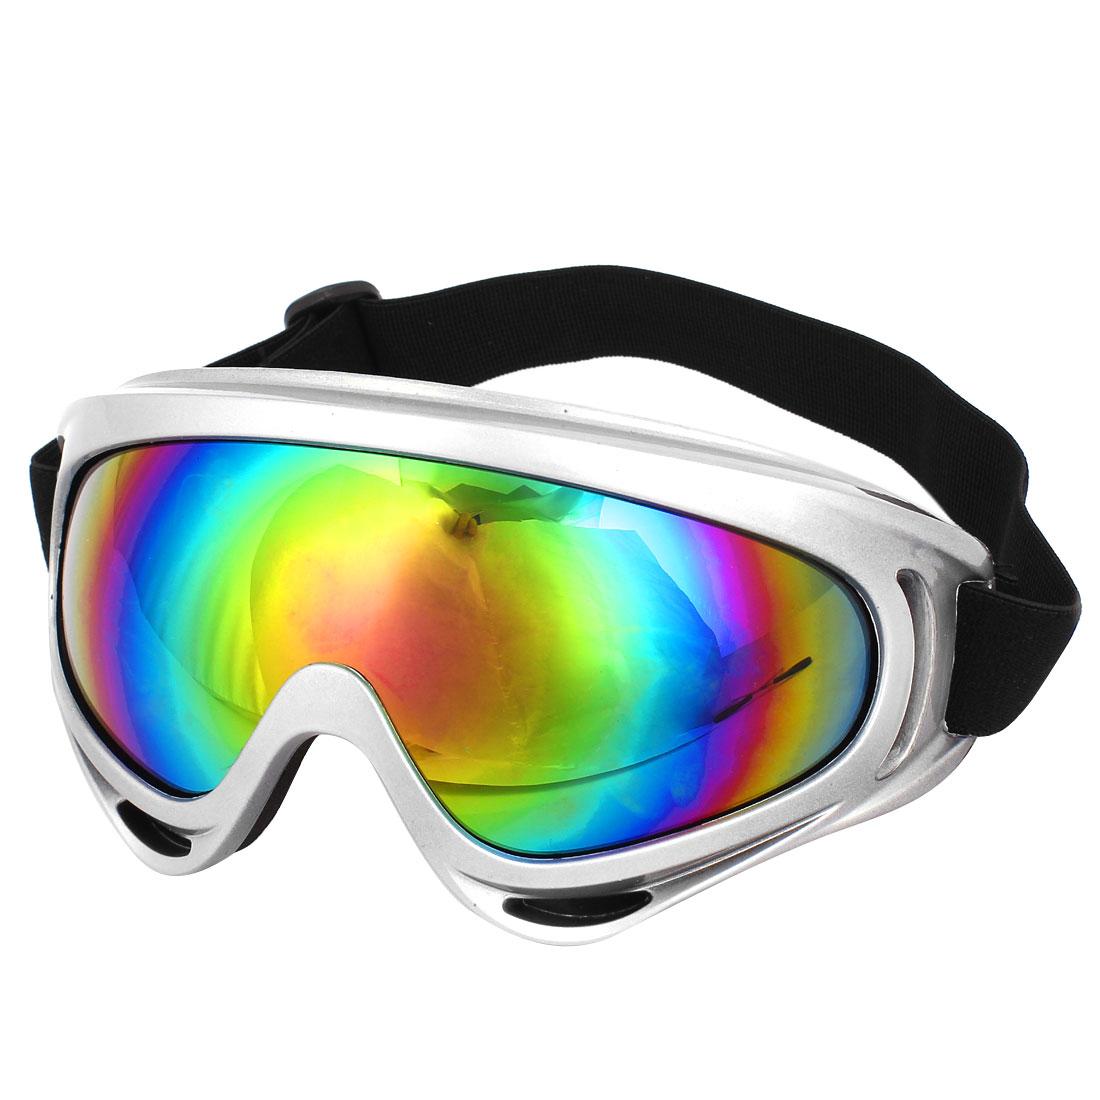 Men Women Ski Snowboard Skate Goggles Snowboard Sunglasses Colors Lens Sports